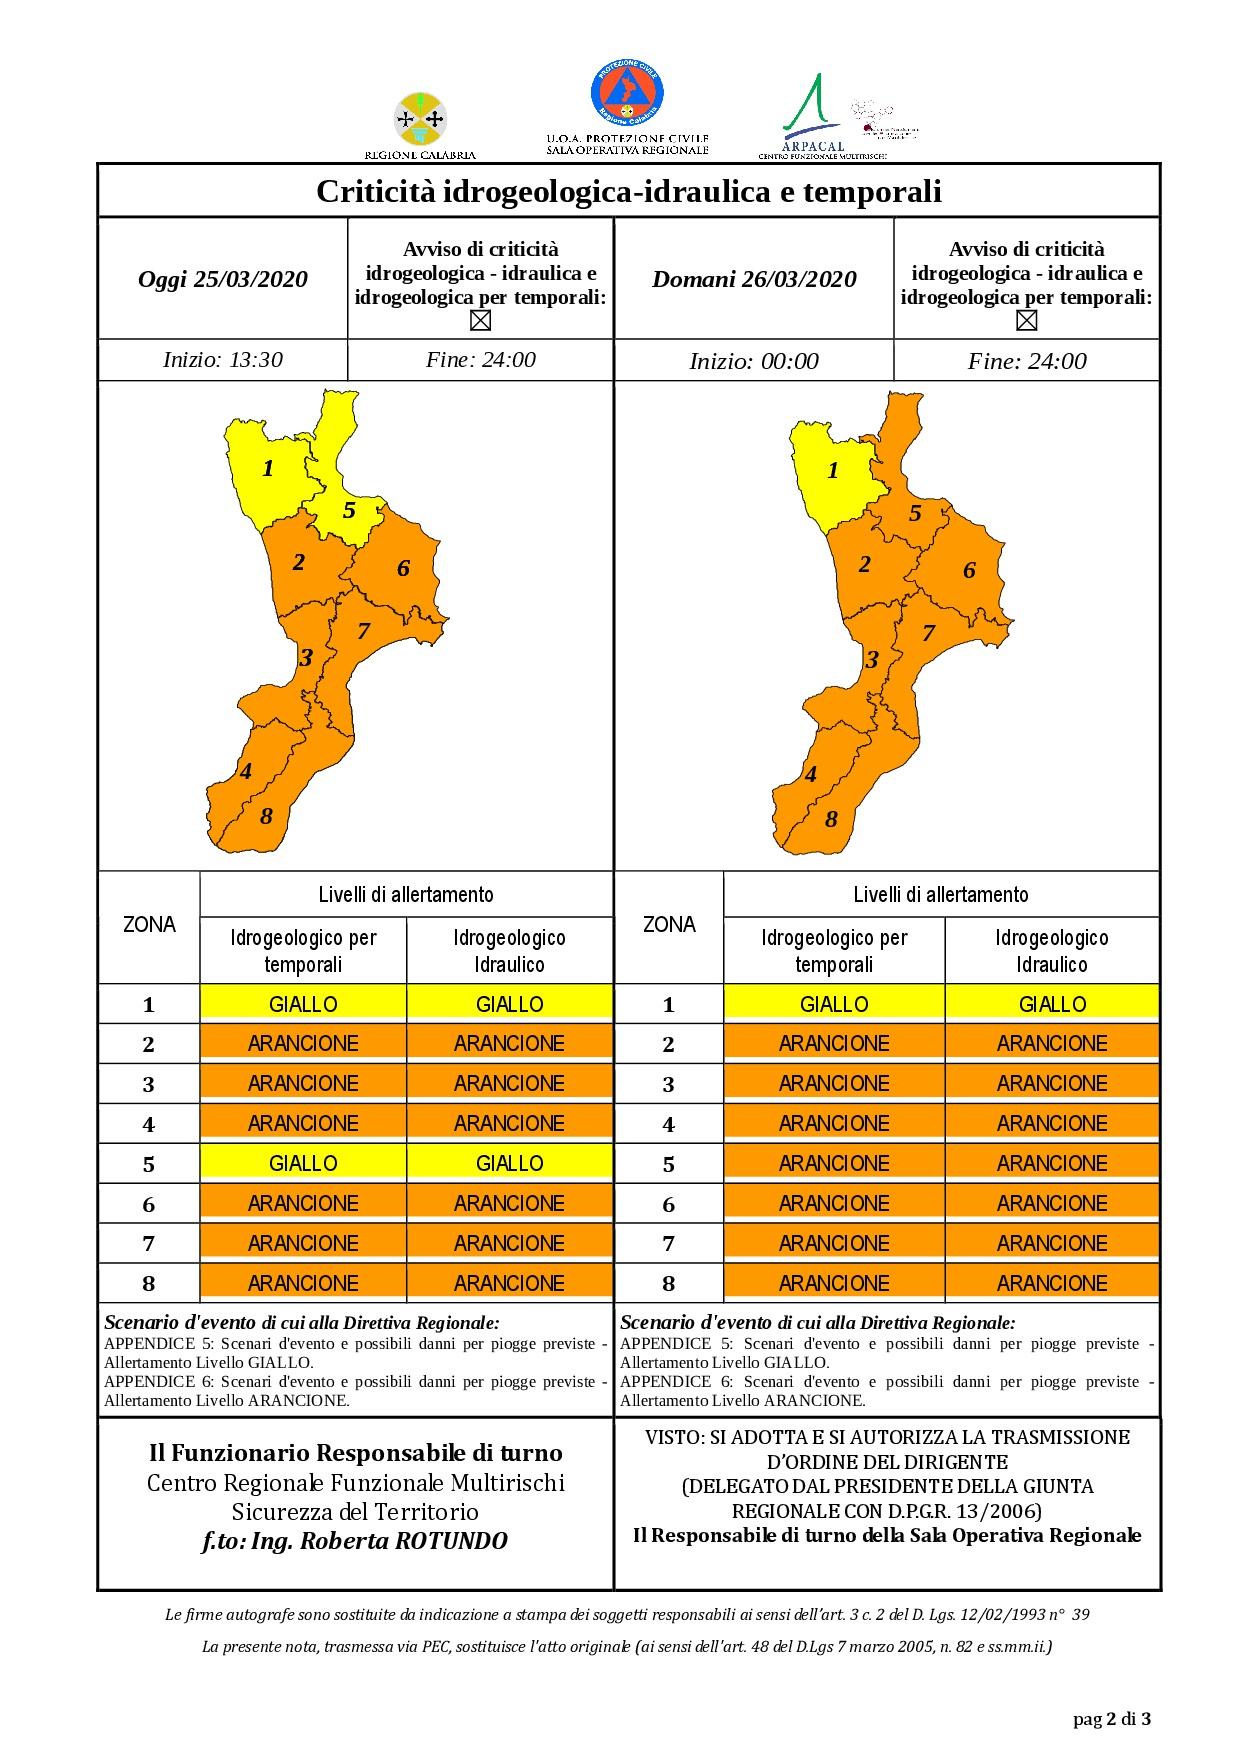 Criticità idrogeologica-idraulica e temporali in Calabria 25-03-2020